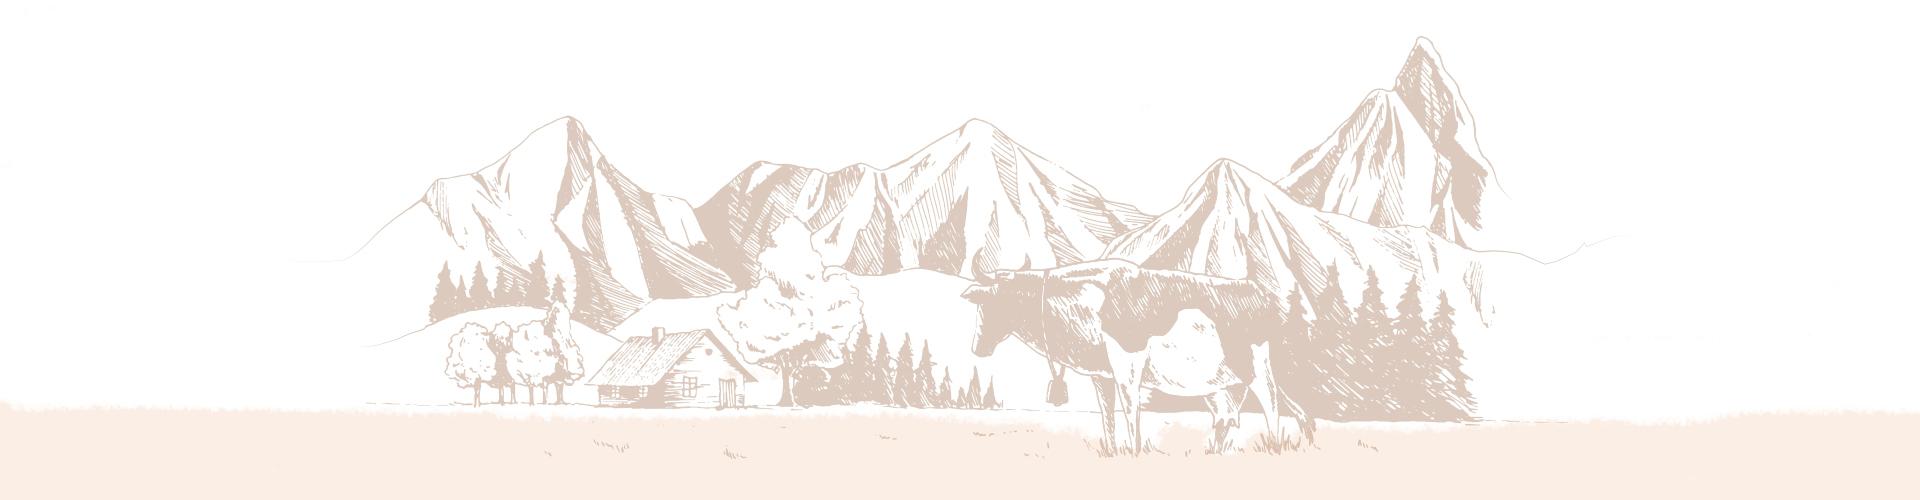 vache montagne footer